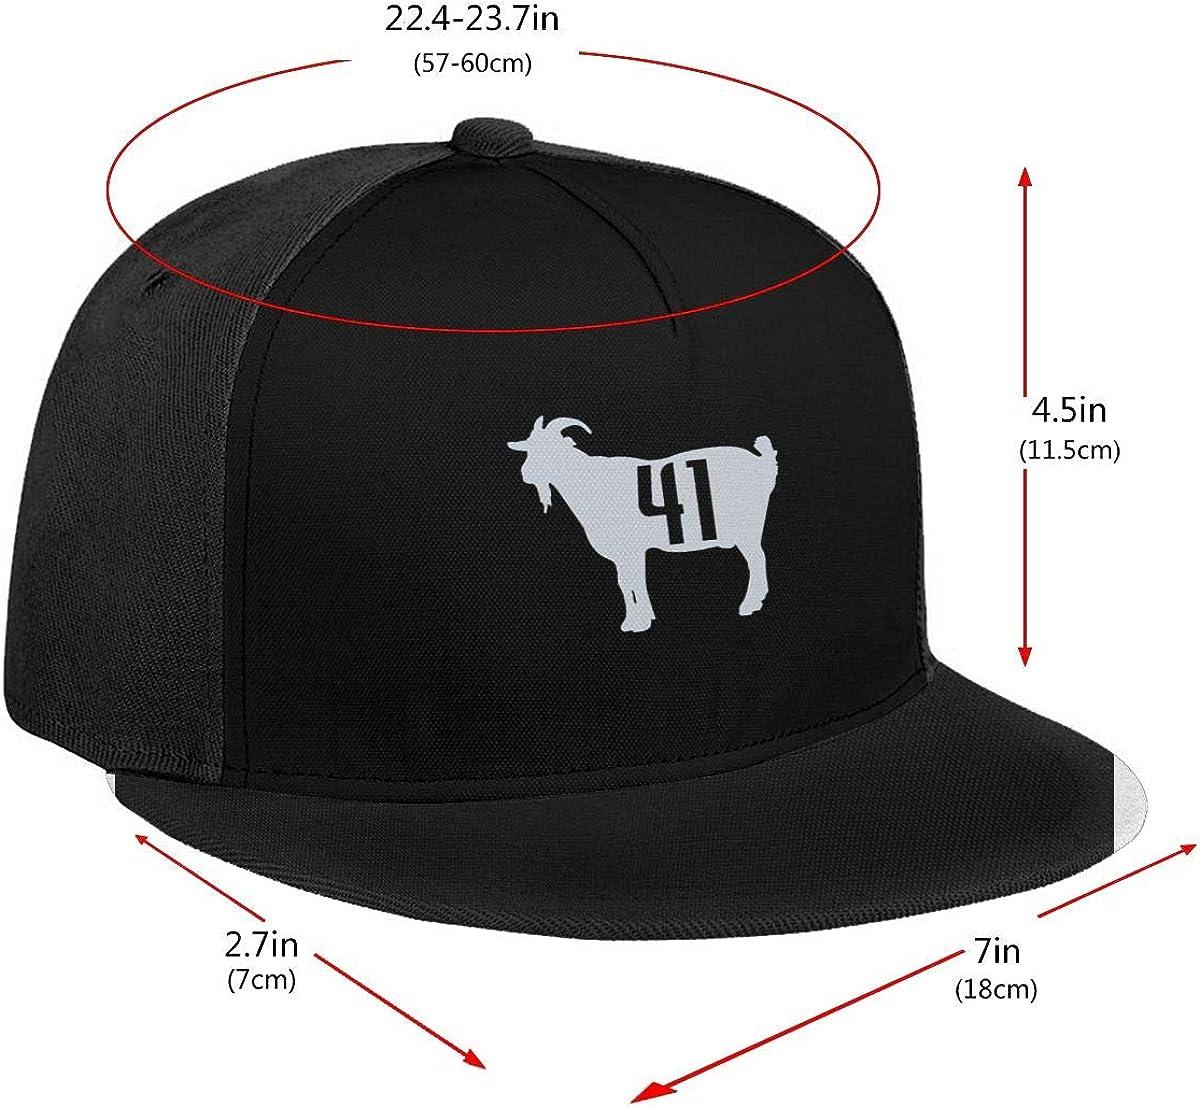 DeniCar Unisex Adjustable Baseball Caps Dirk-Nowitzki Goat 41 Skull Cap Black